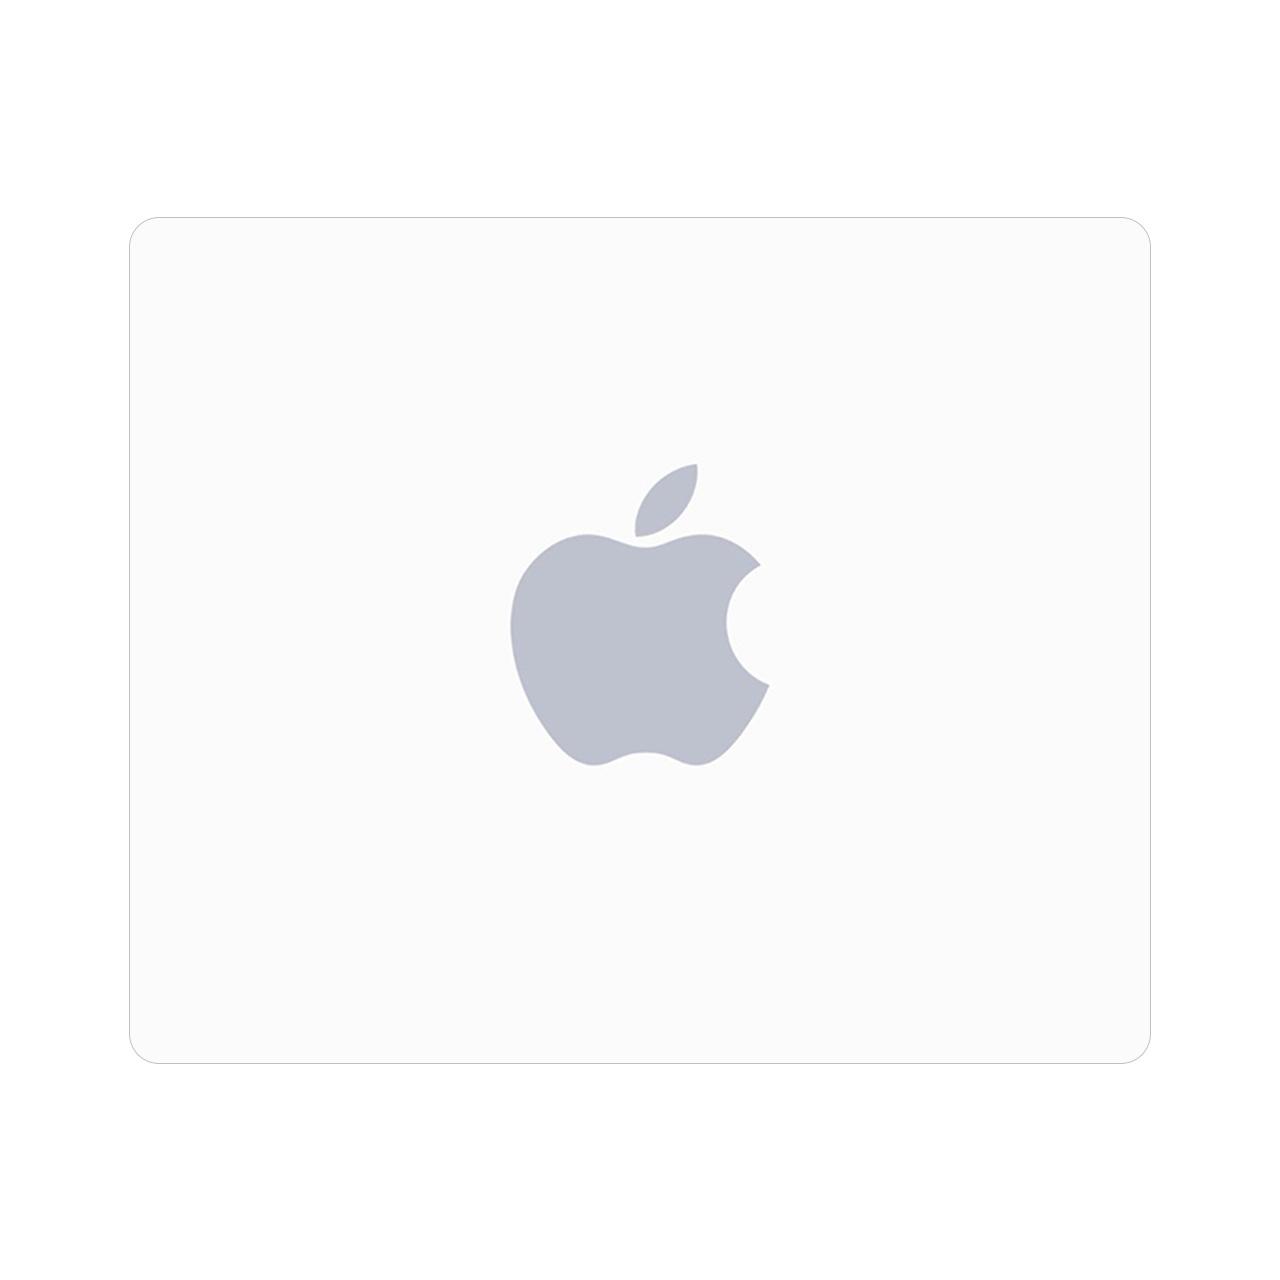 ماوس پد طرح اپل مدل MP1558